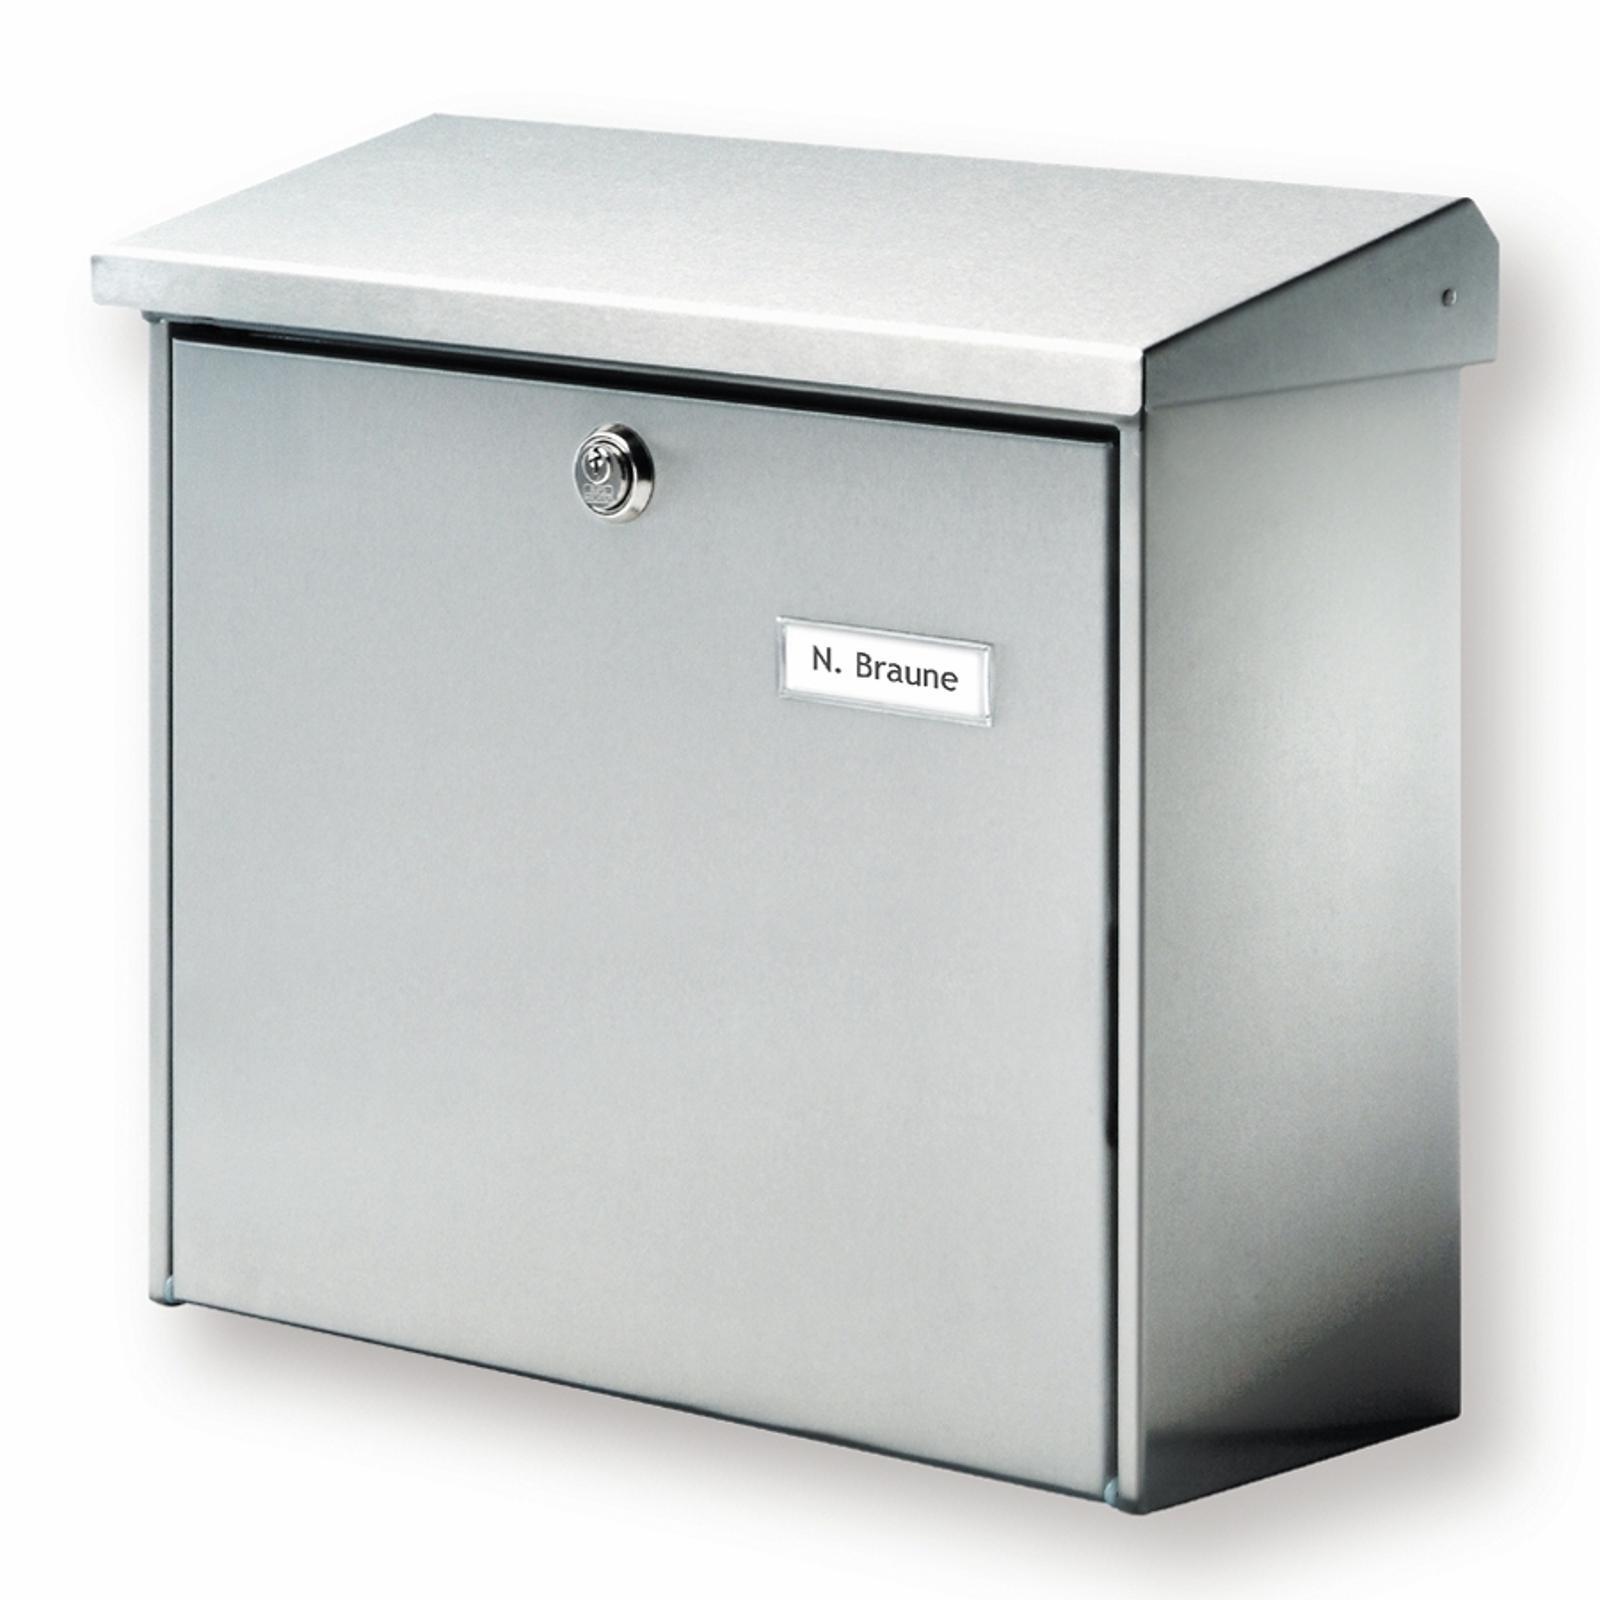 Edelstahl-Briefkasten Comfort